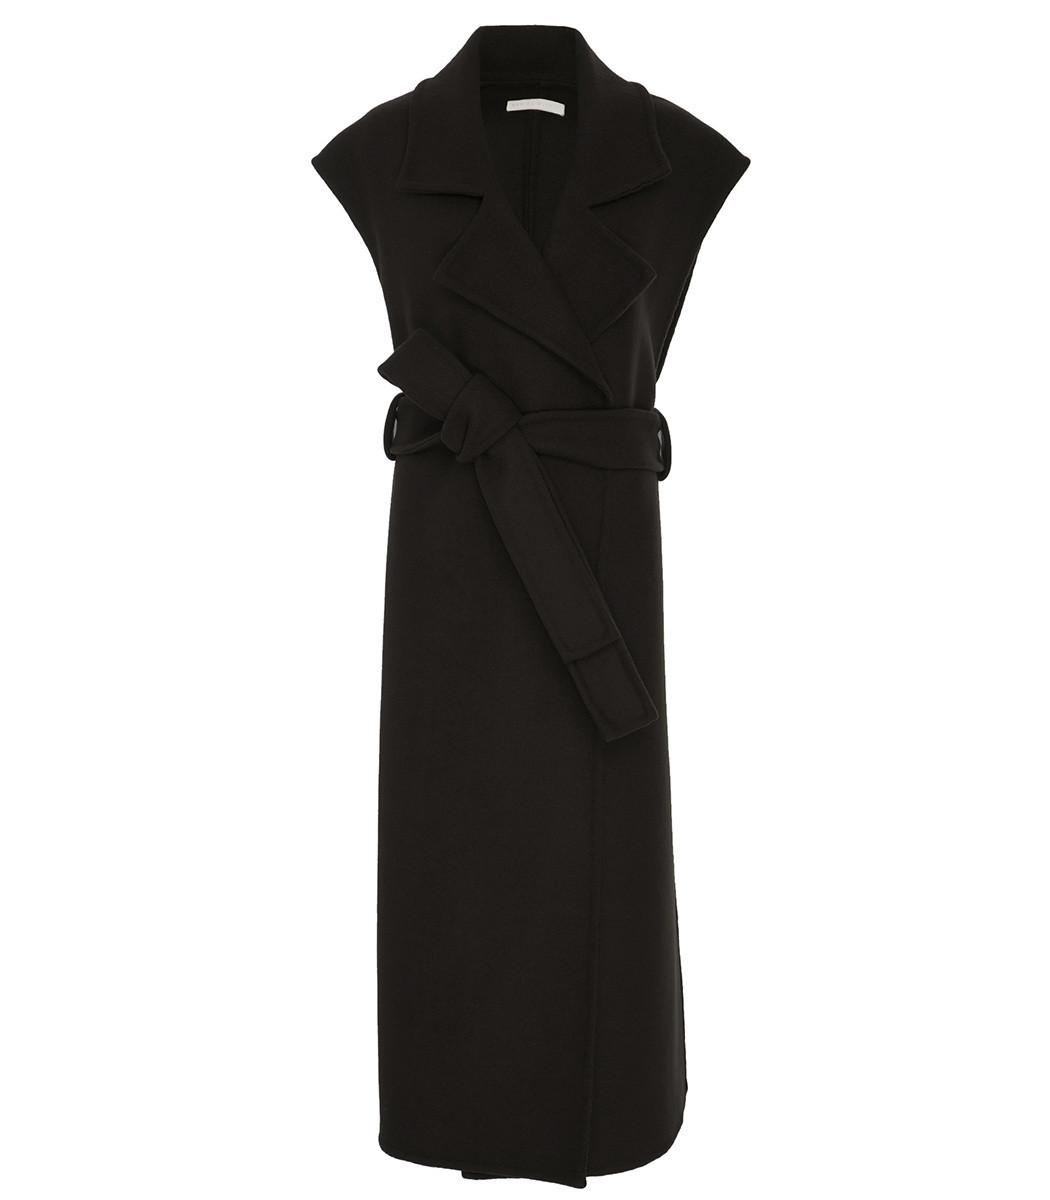 MARISA WITKIN Outerwear Vest In Black